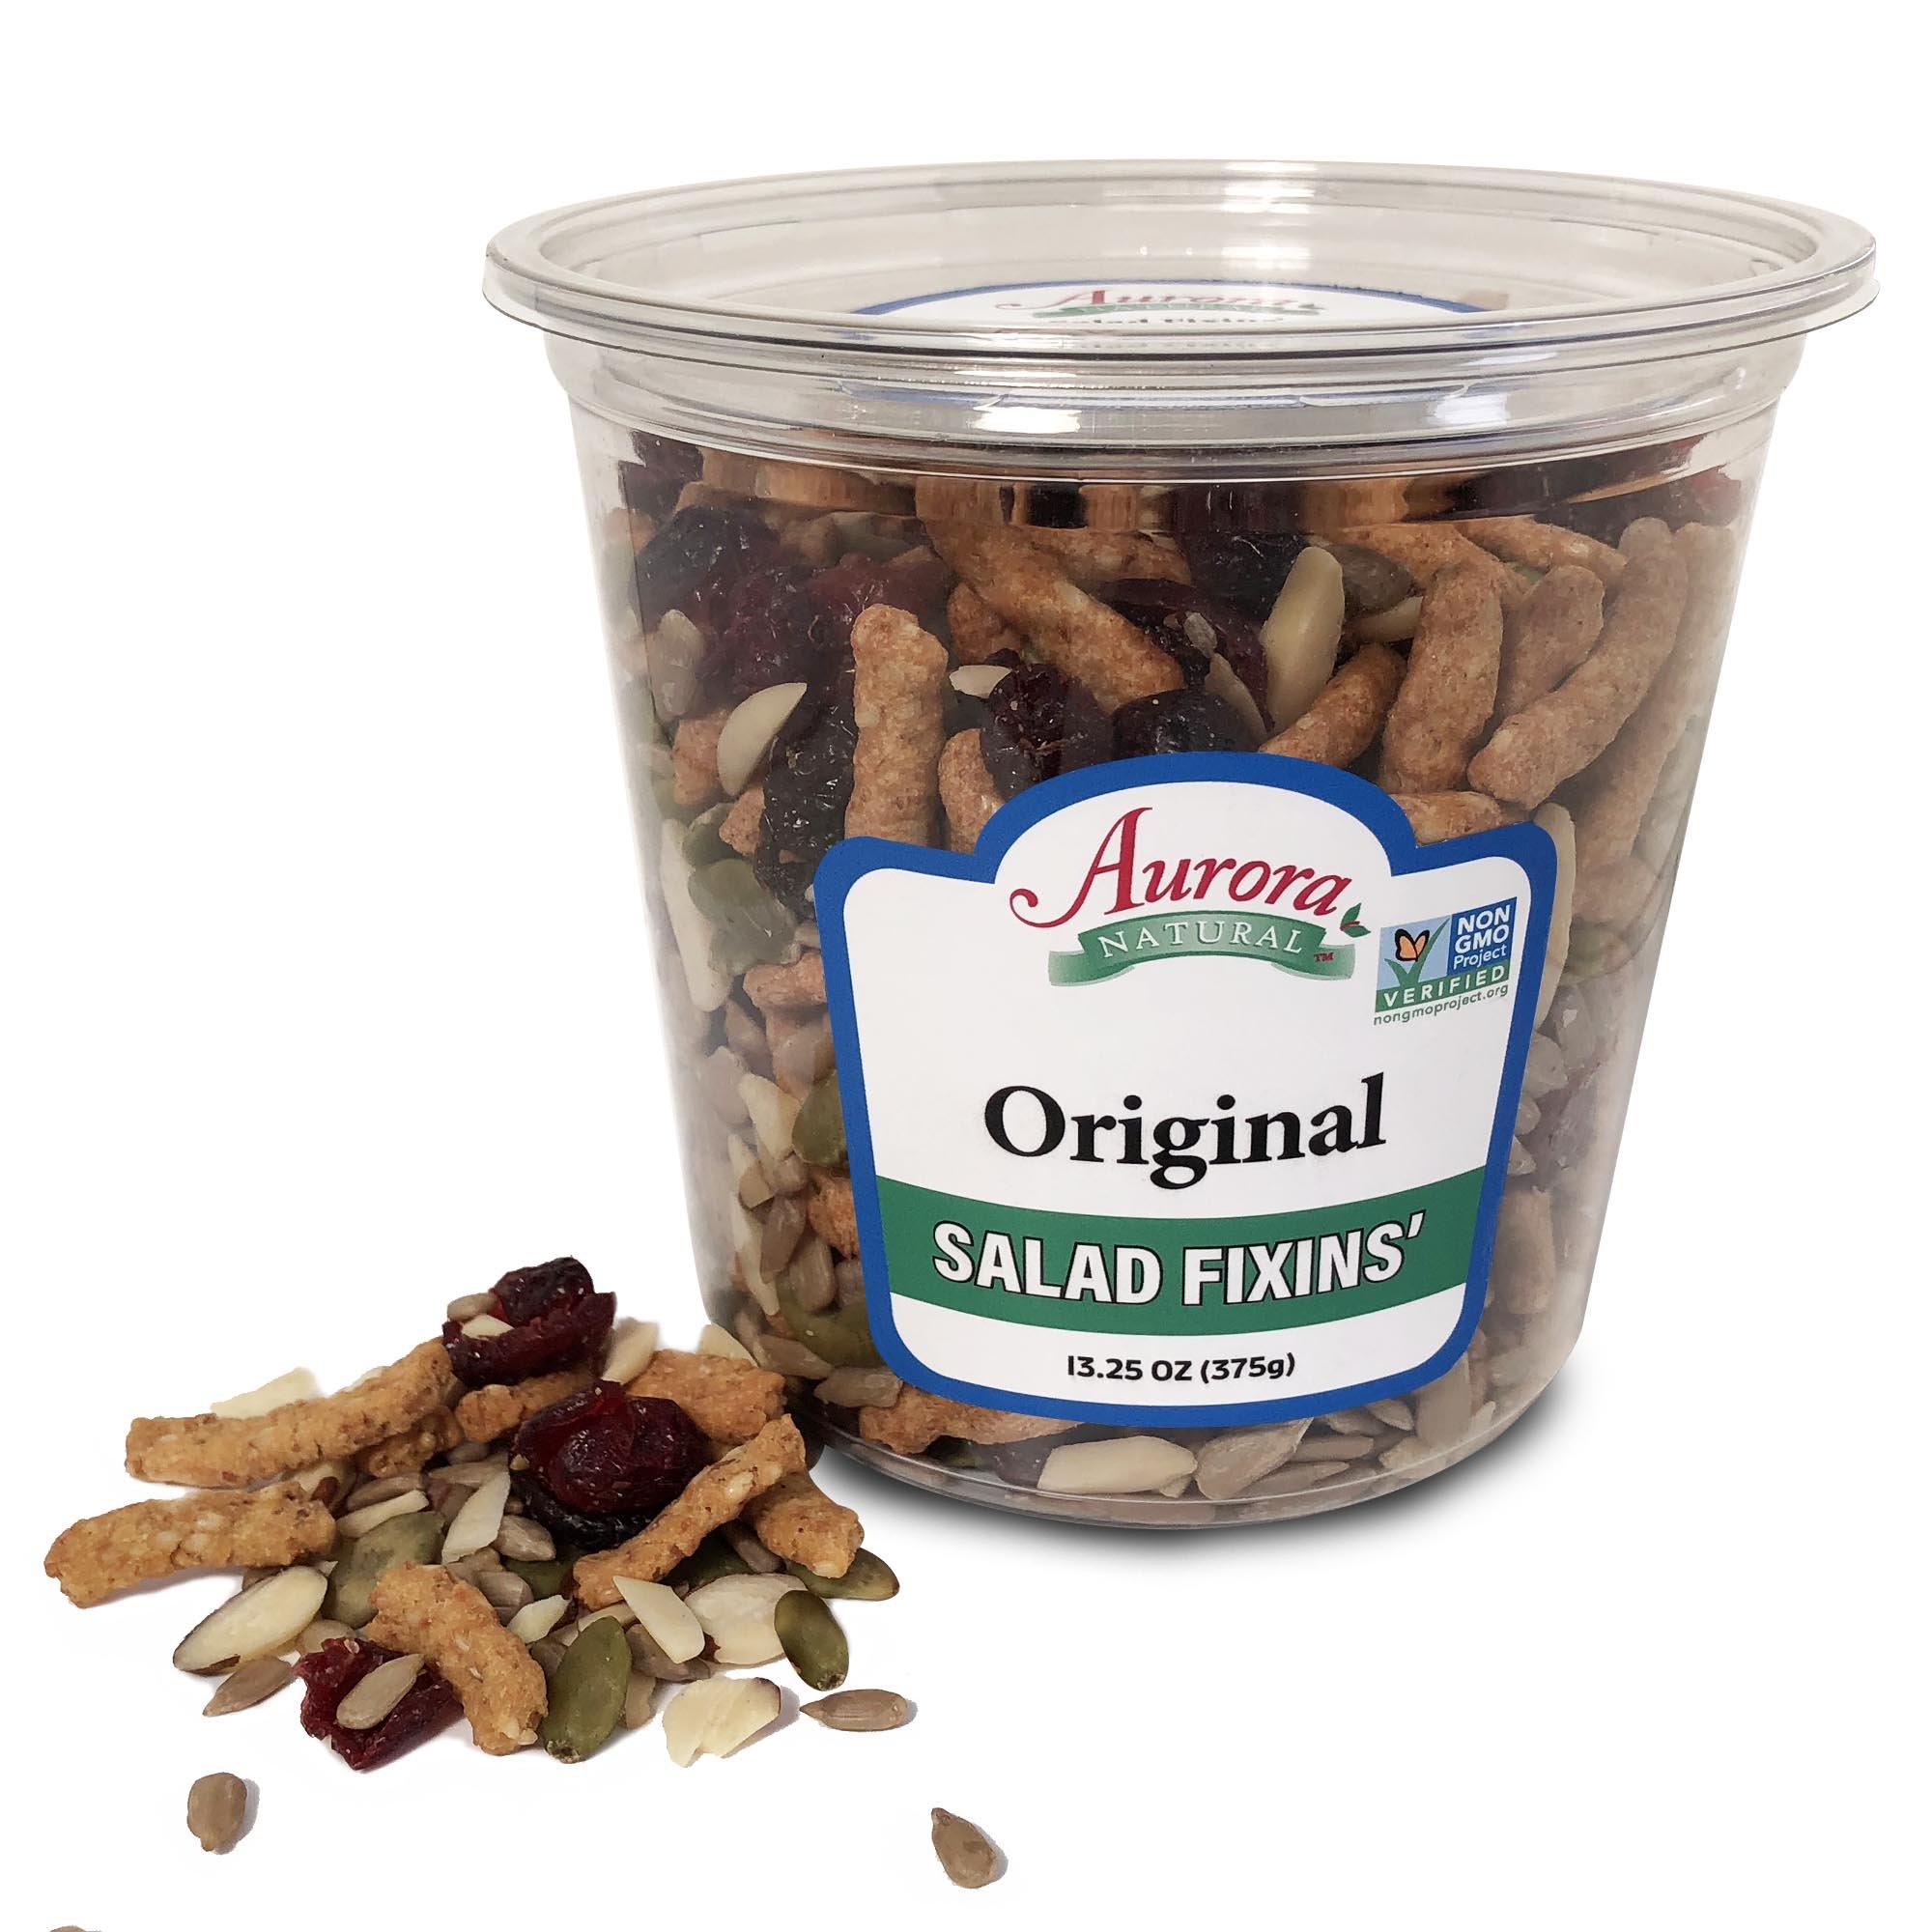 Aurora Natural Products Original Salad Fixins, 13.25 Ounce